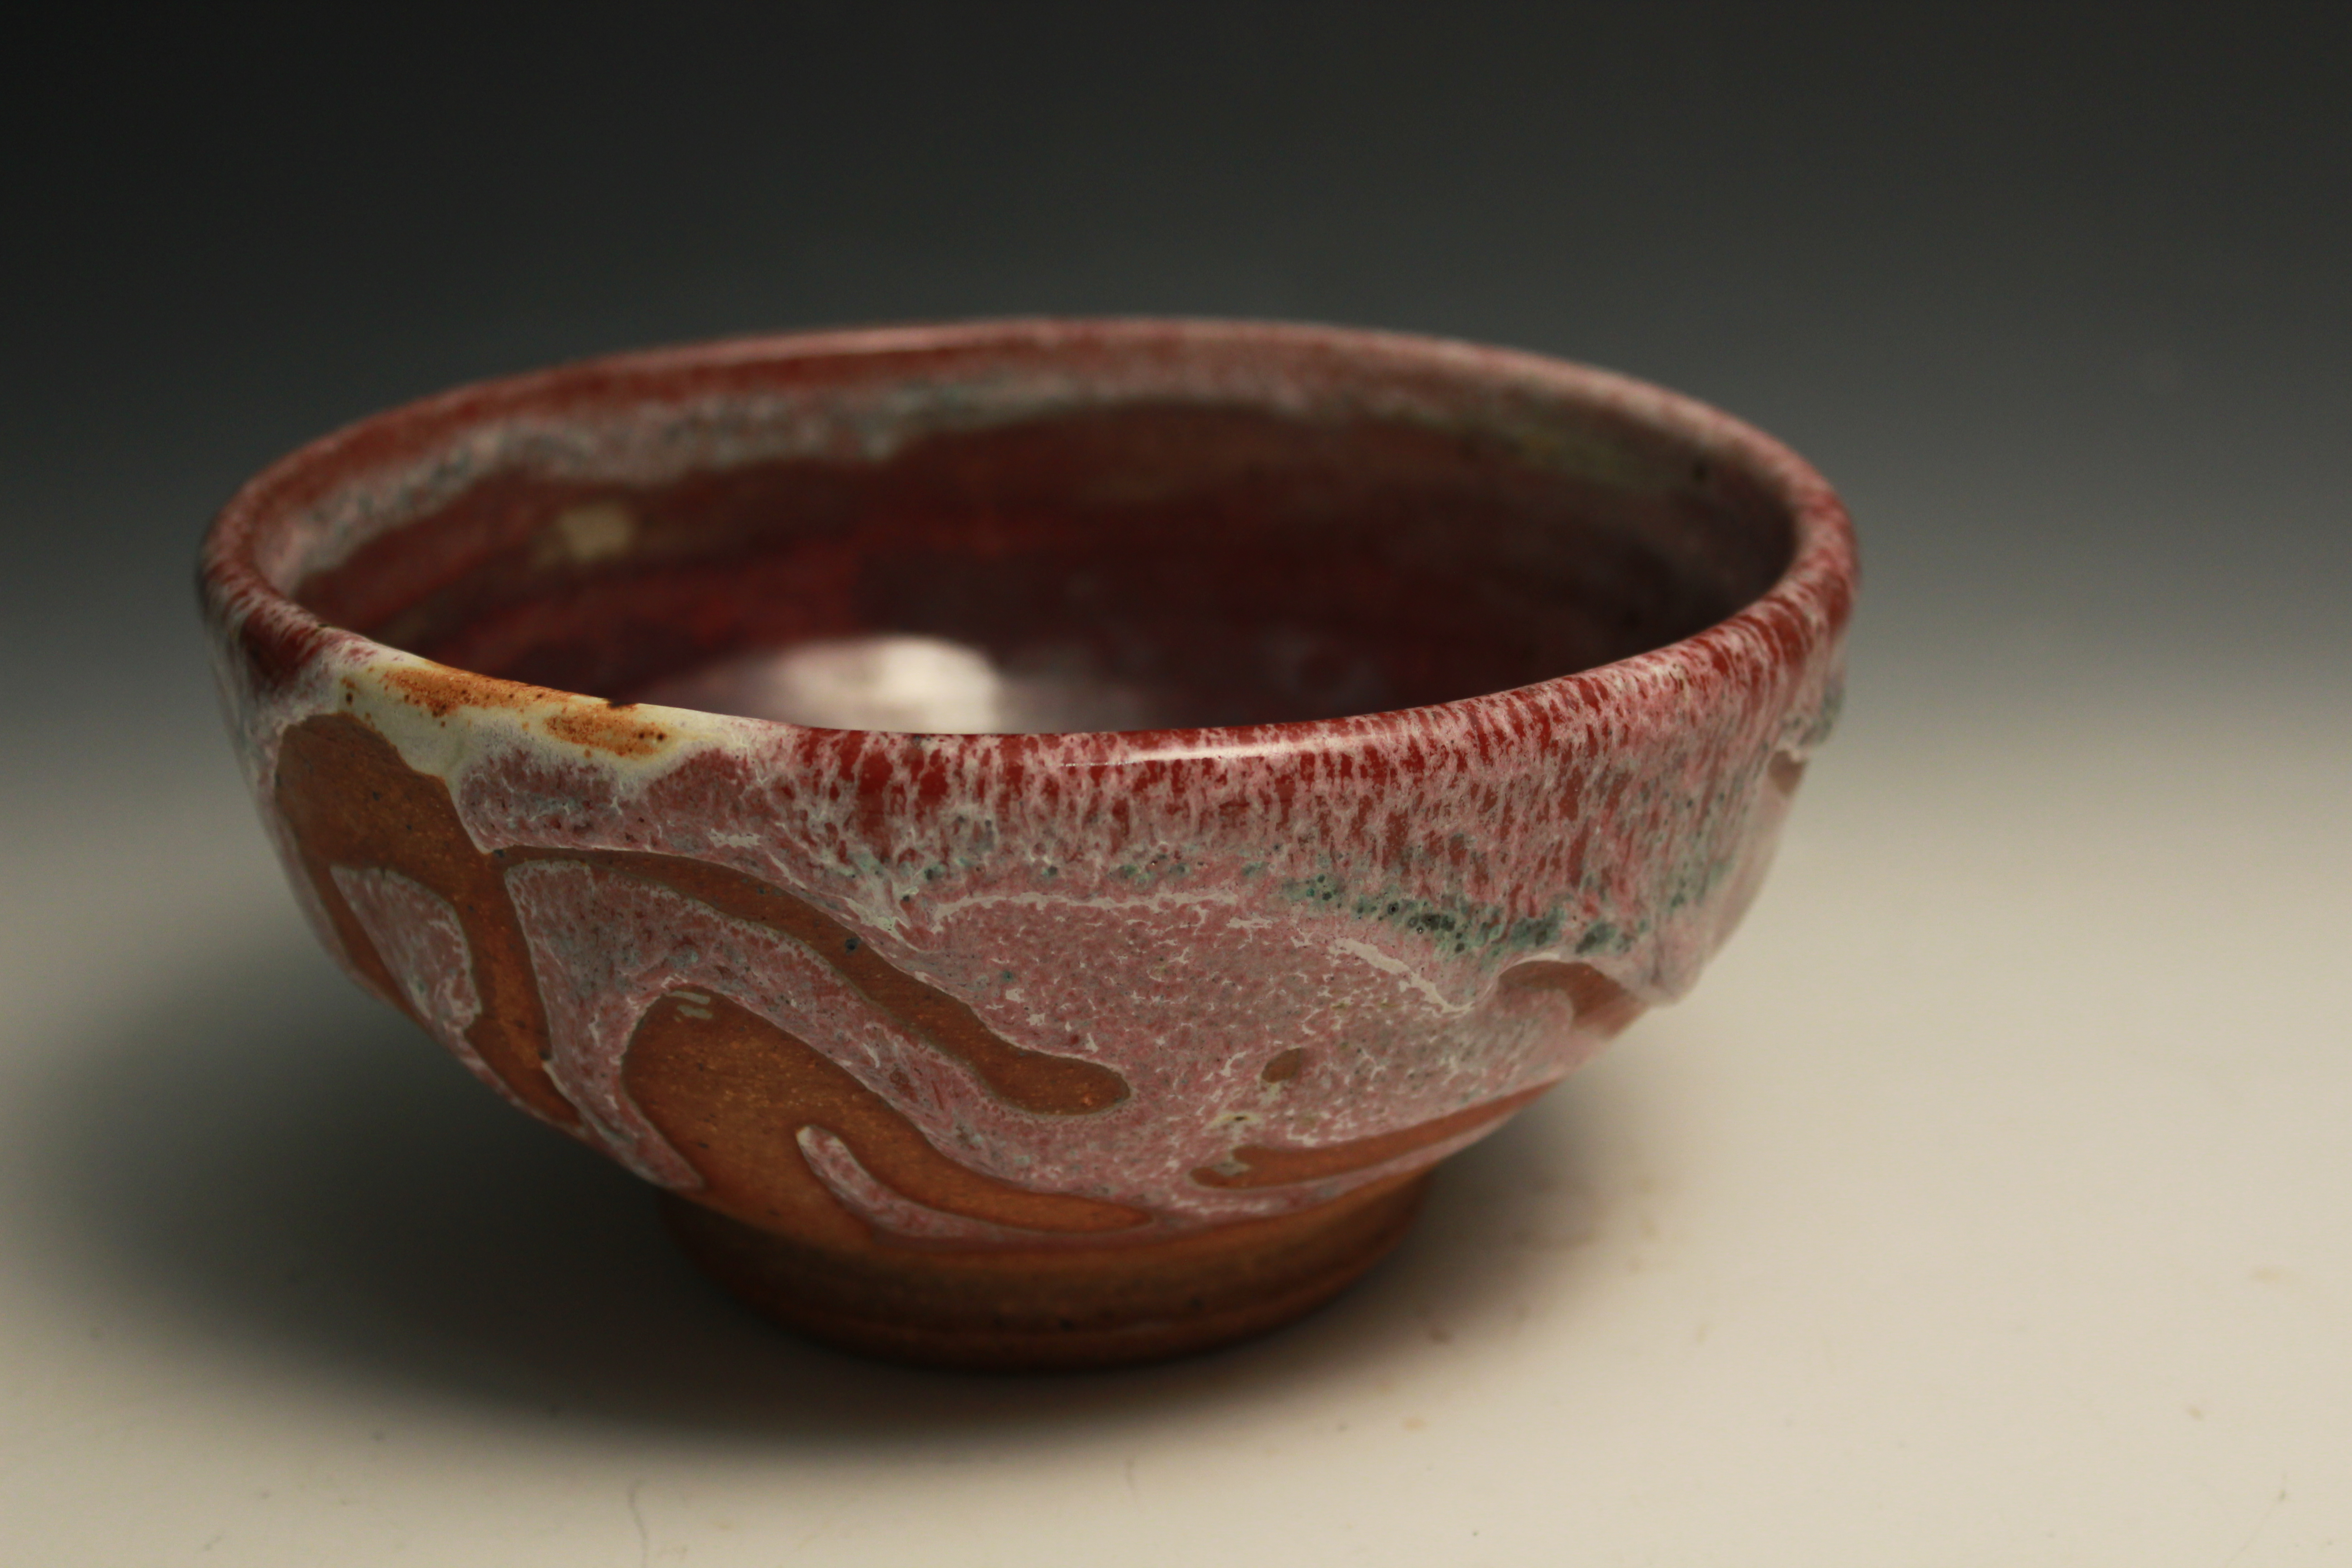 Red stoneware